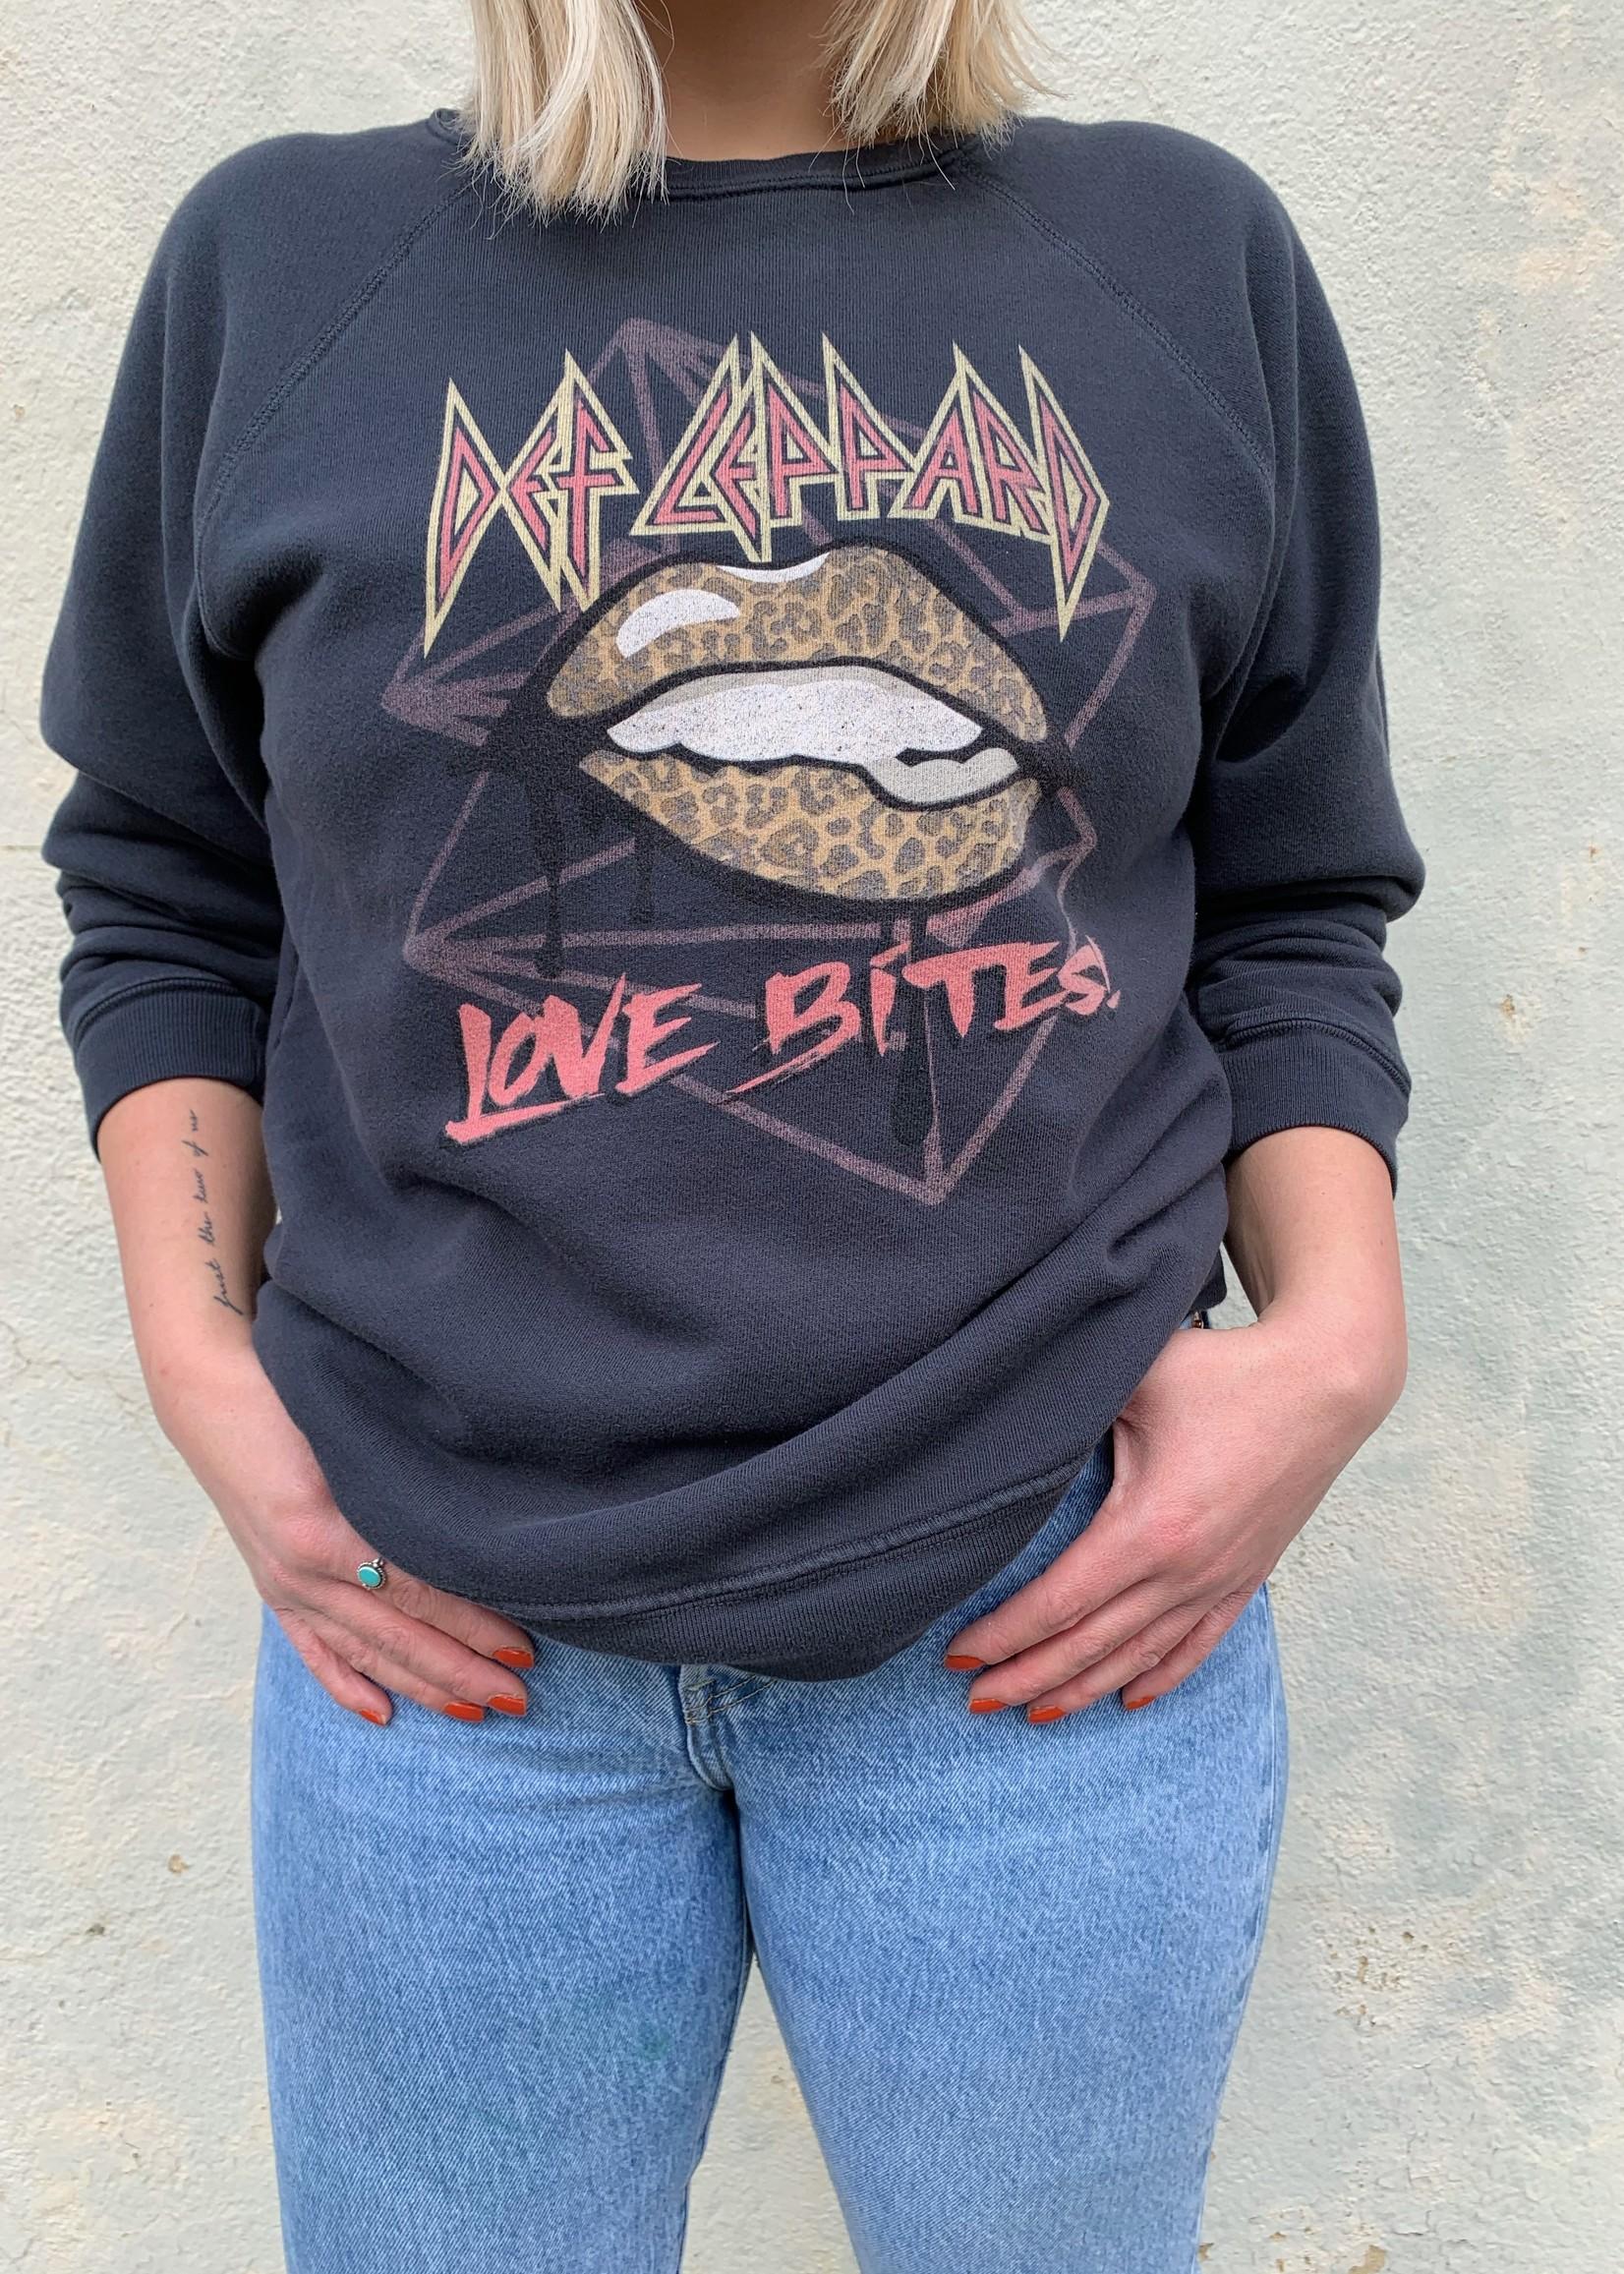 Def Leppard Love Bites Crewneck Sweatshirt